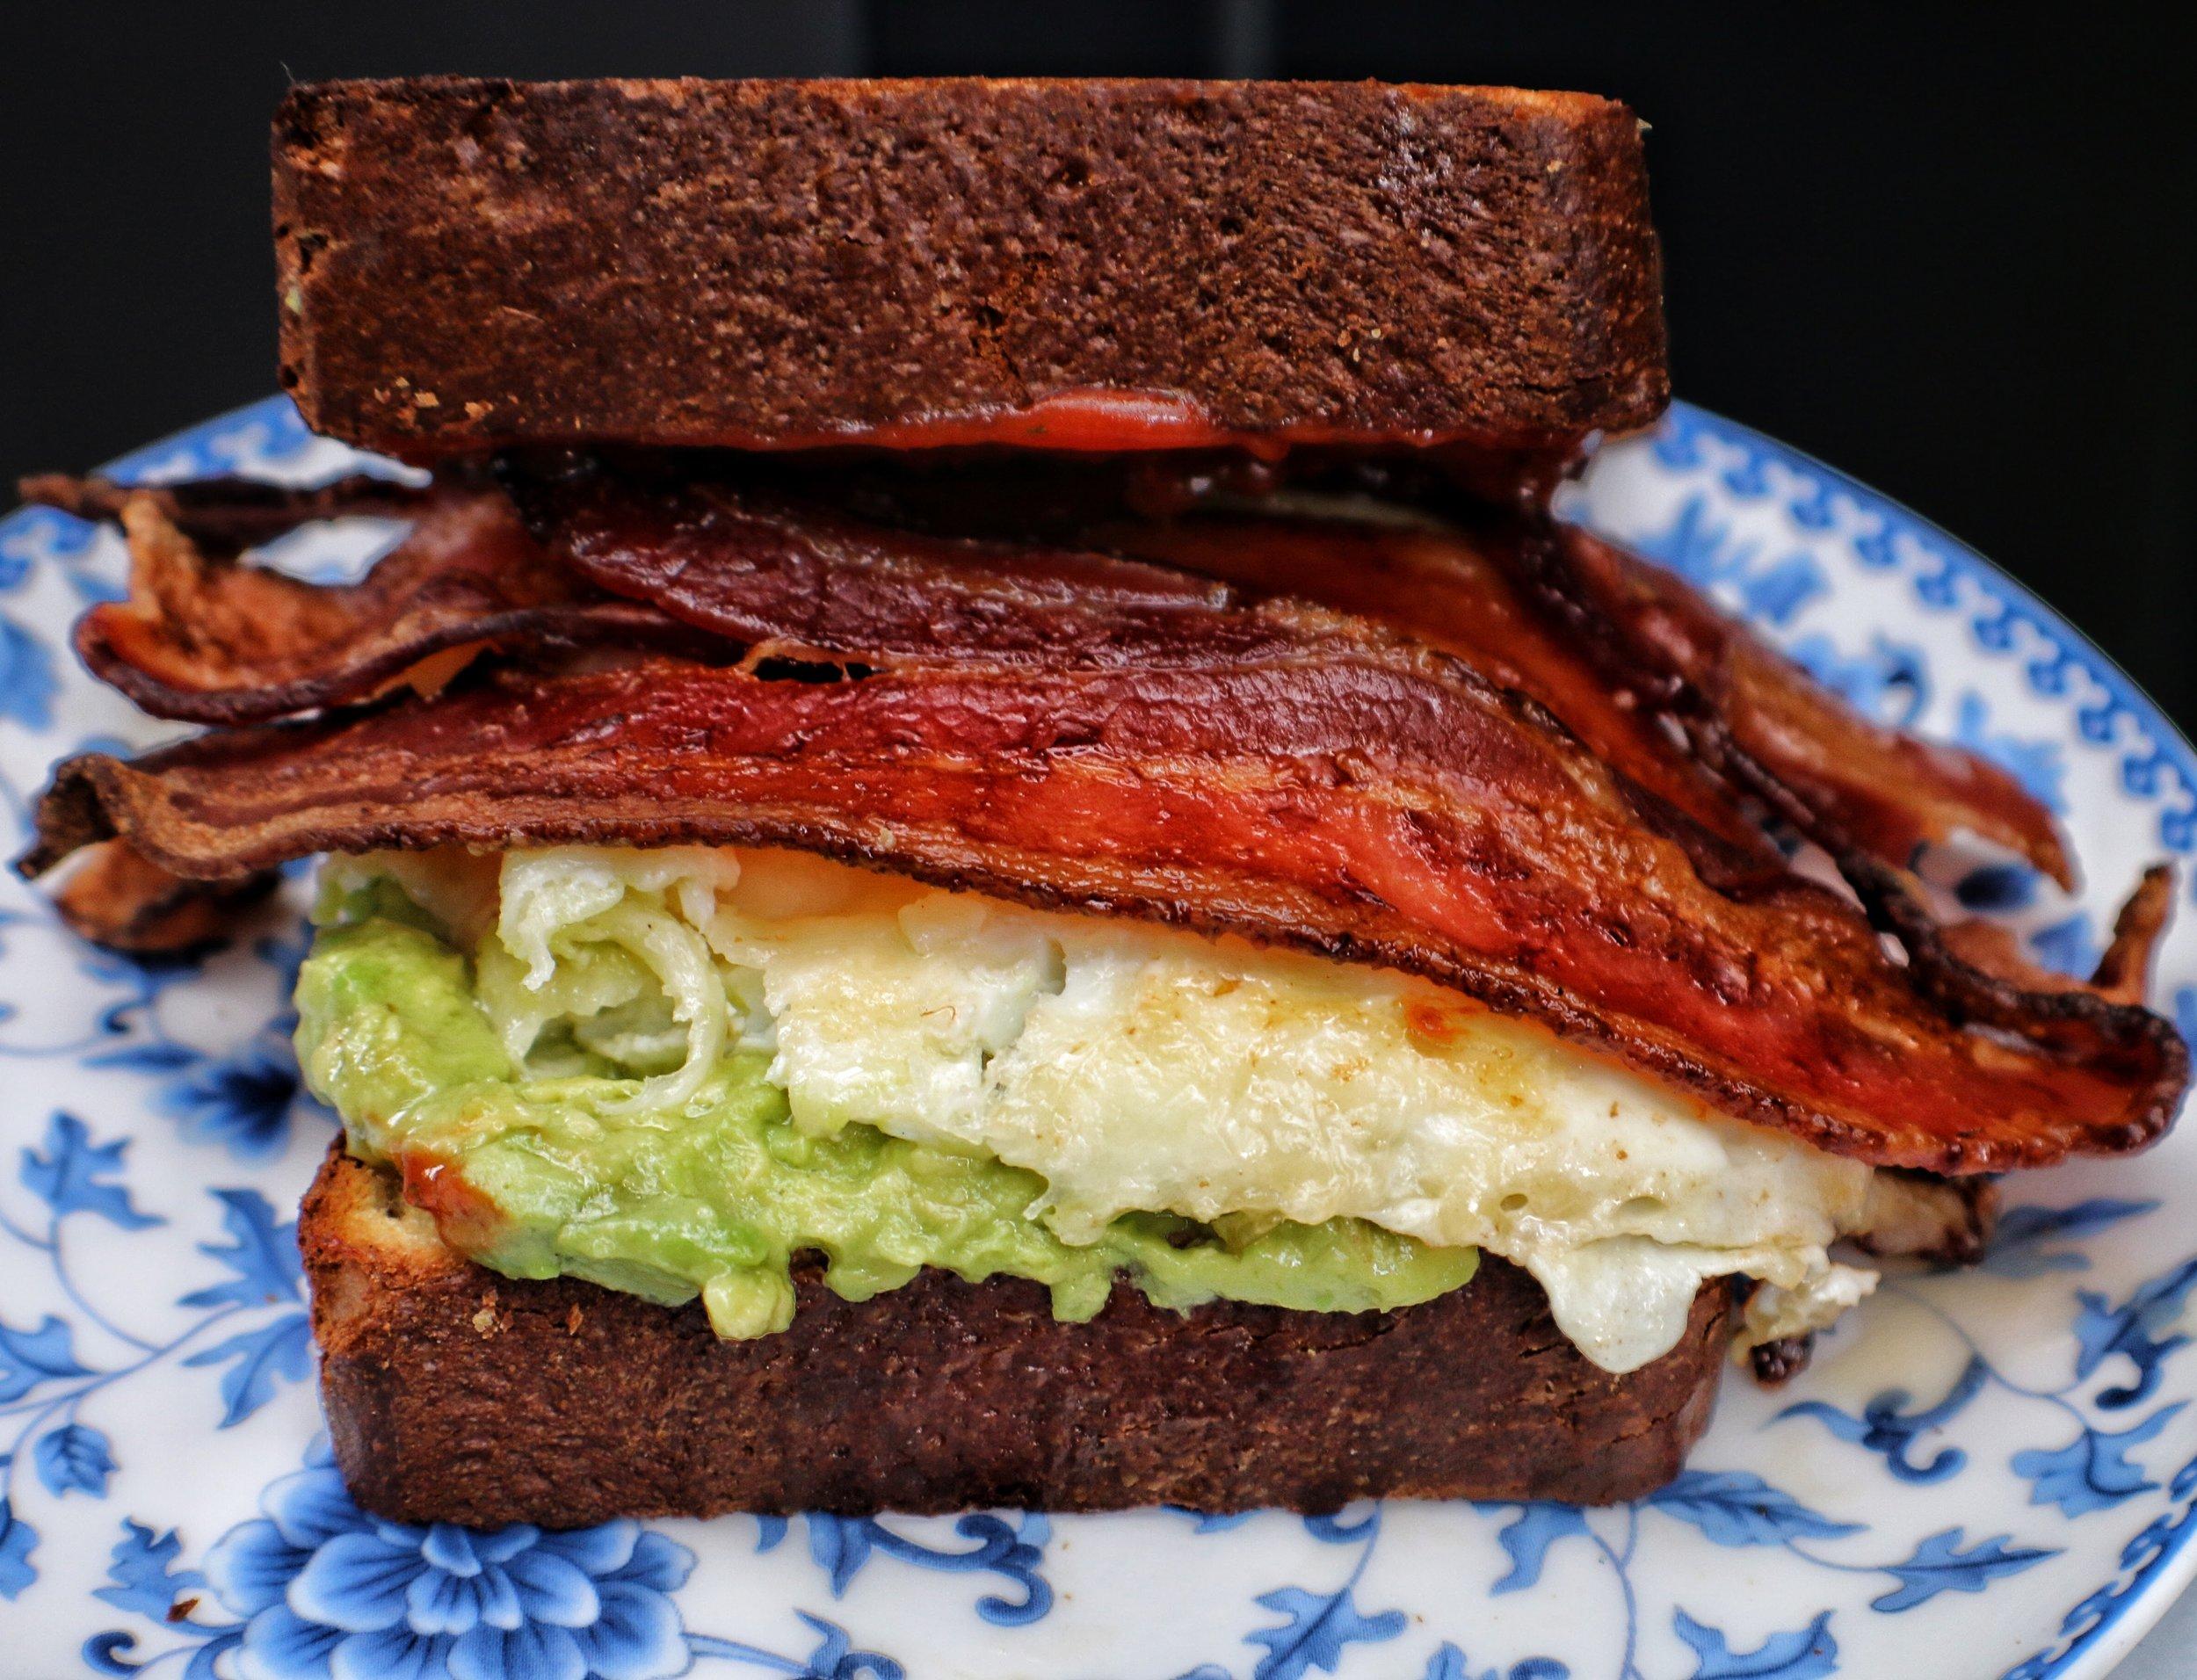 breakfast sandwich / avocado, bacon, egg, srirancha ketchup